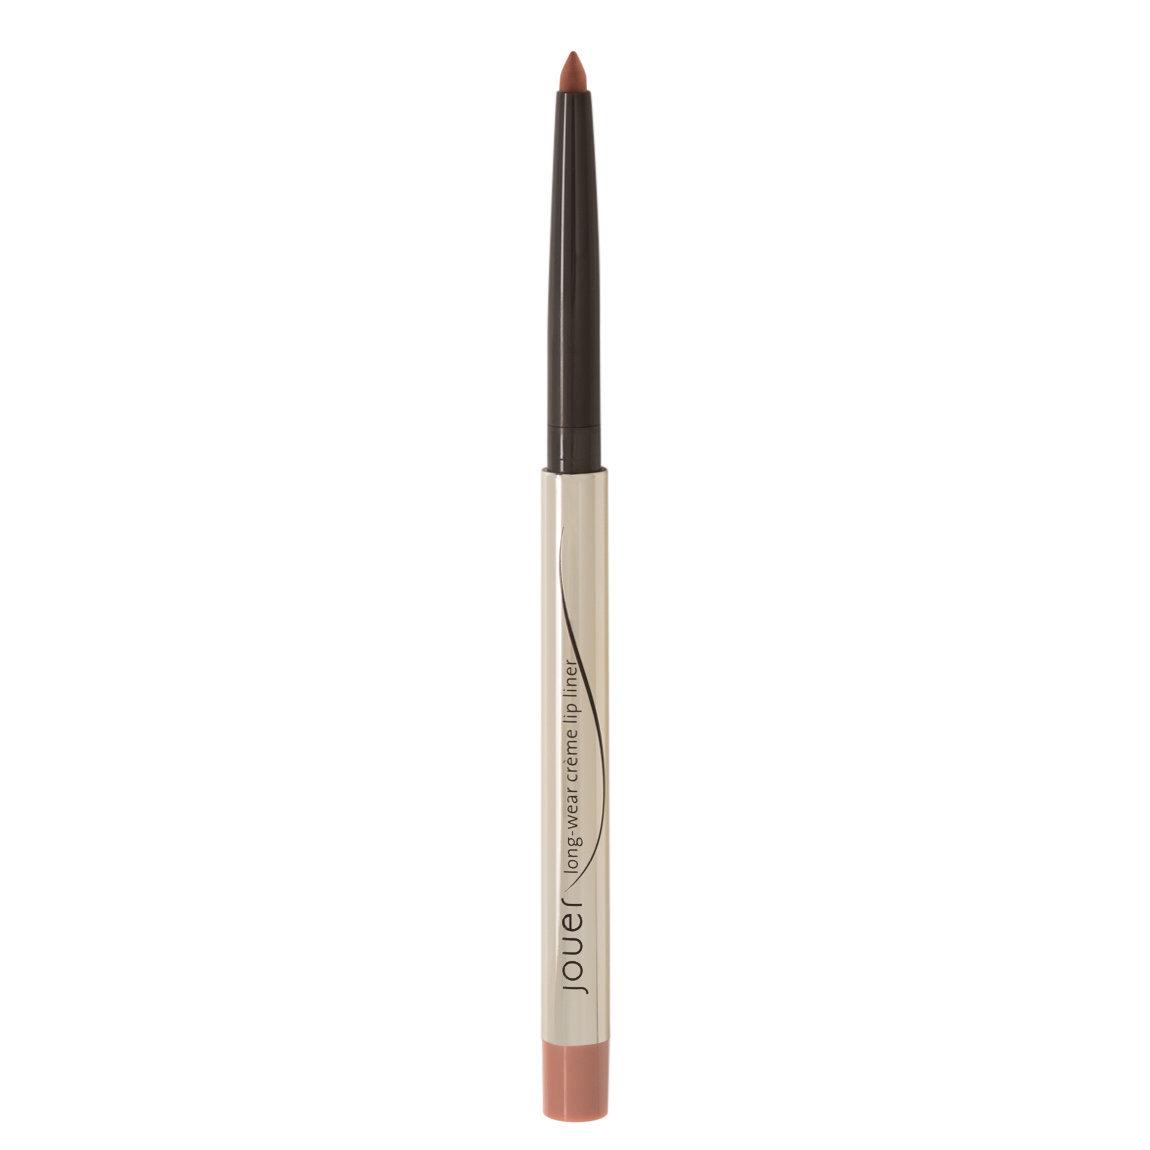 Jouer Cosmetics Long-Wear Crème Lip-Liner Fawn